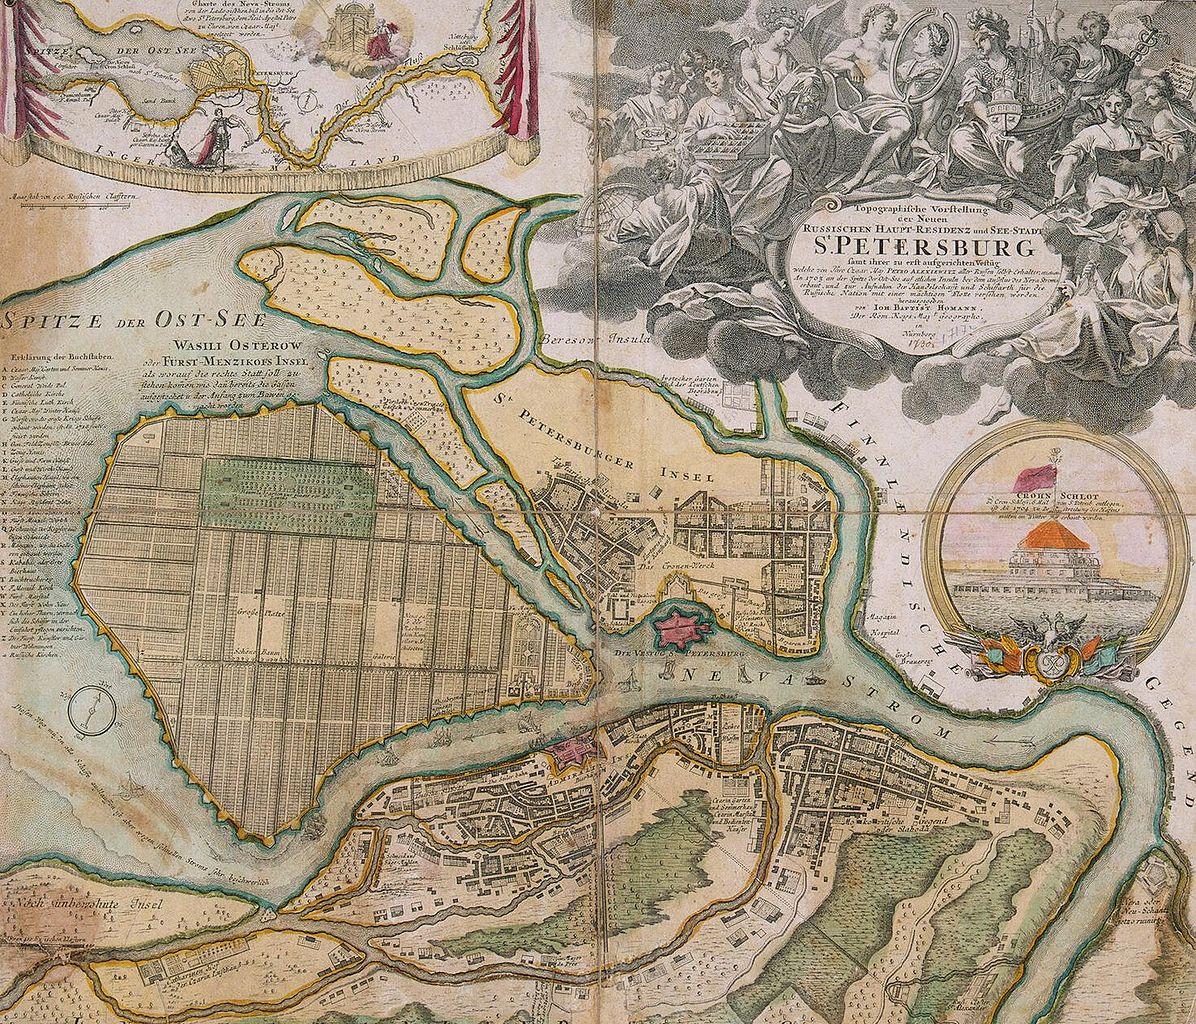 План Санкт-Петербурга И. Хоманна. 1720-е (до 1725). Автор: Johann Homann (Wikimedia Commons)